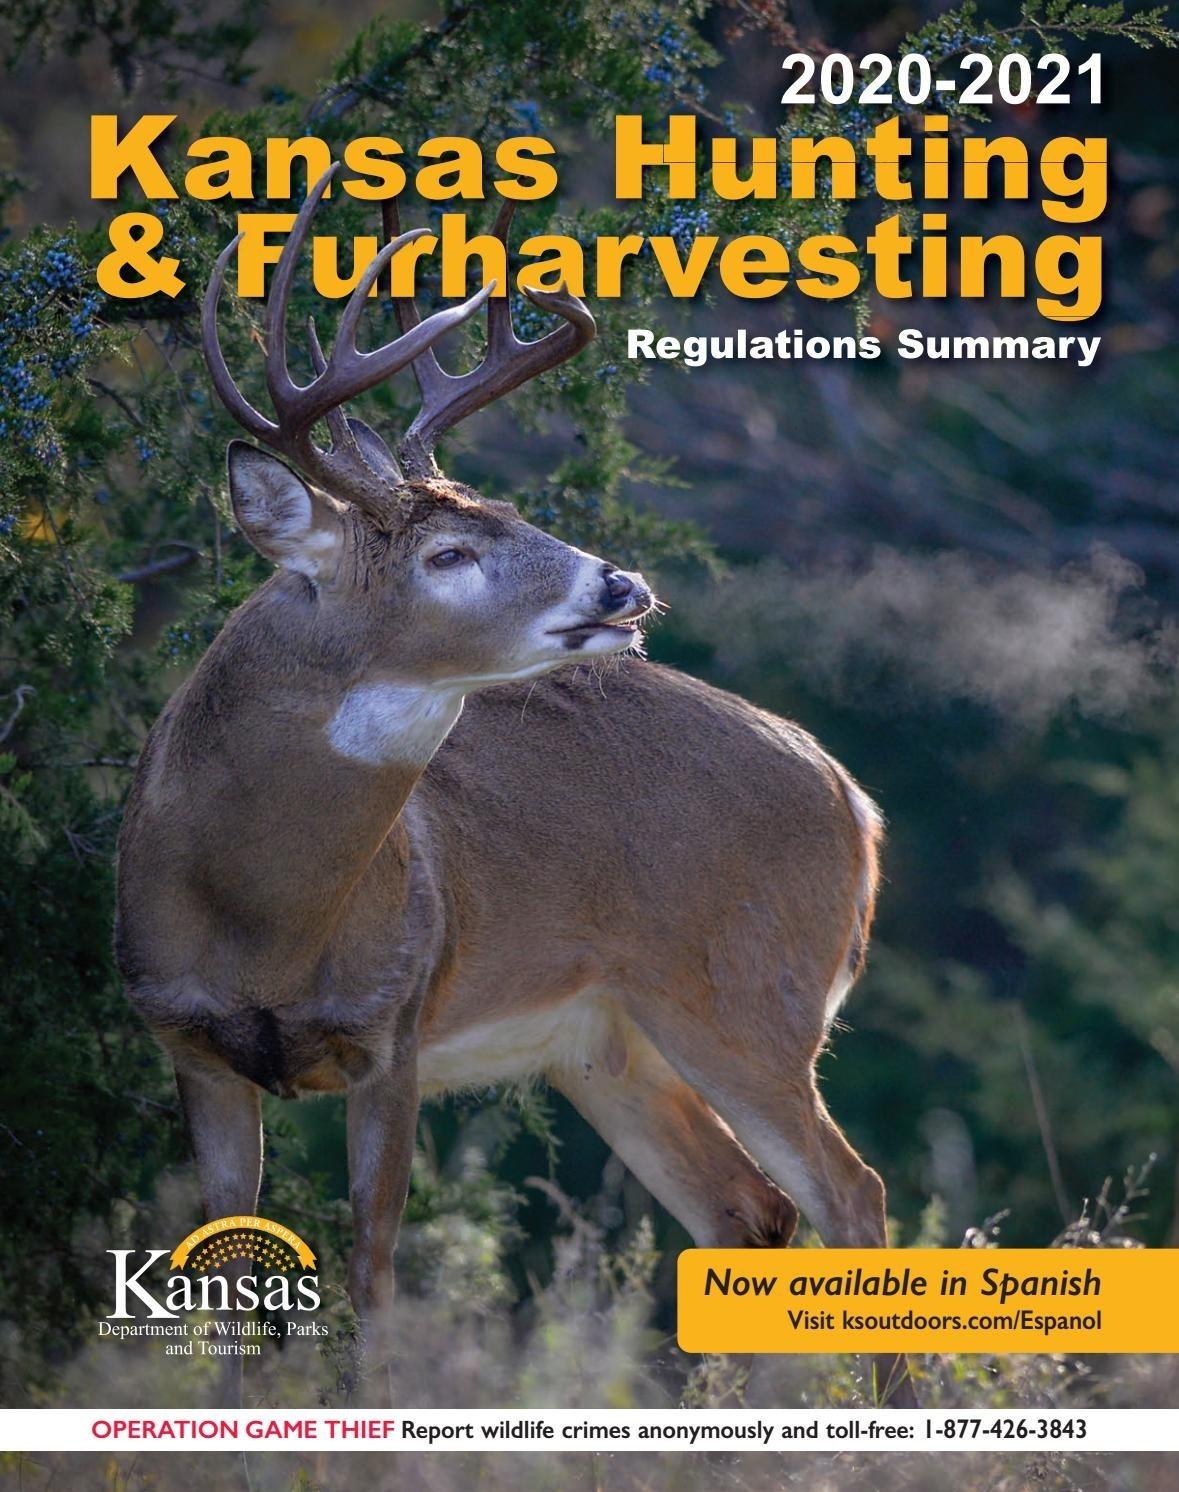 2020-2021 Kansas Hunting & Furharvesting Regulations Summary  2021 Tennessee Whitetail Deer Rut Dates